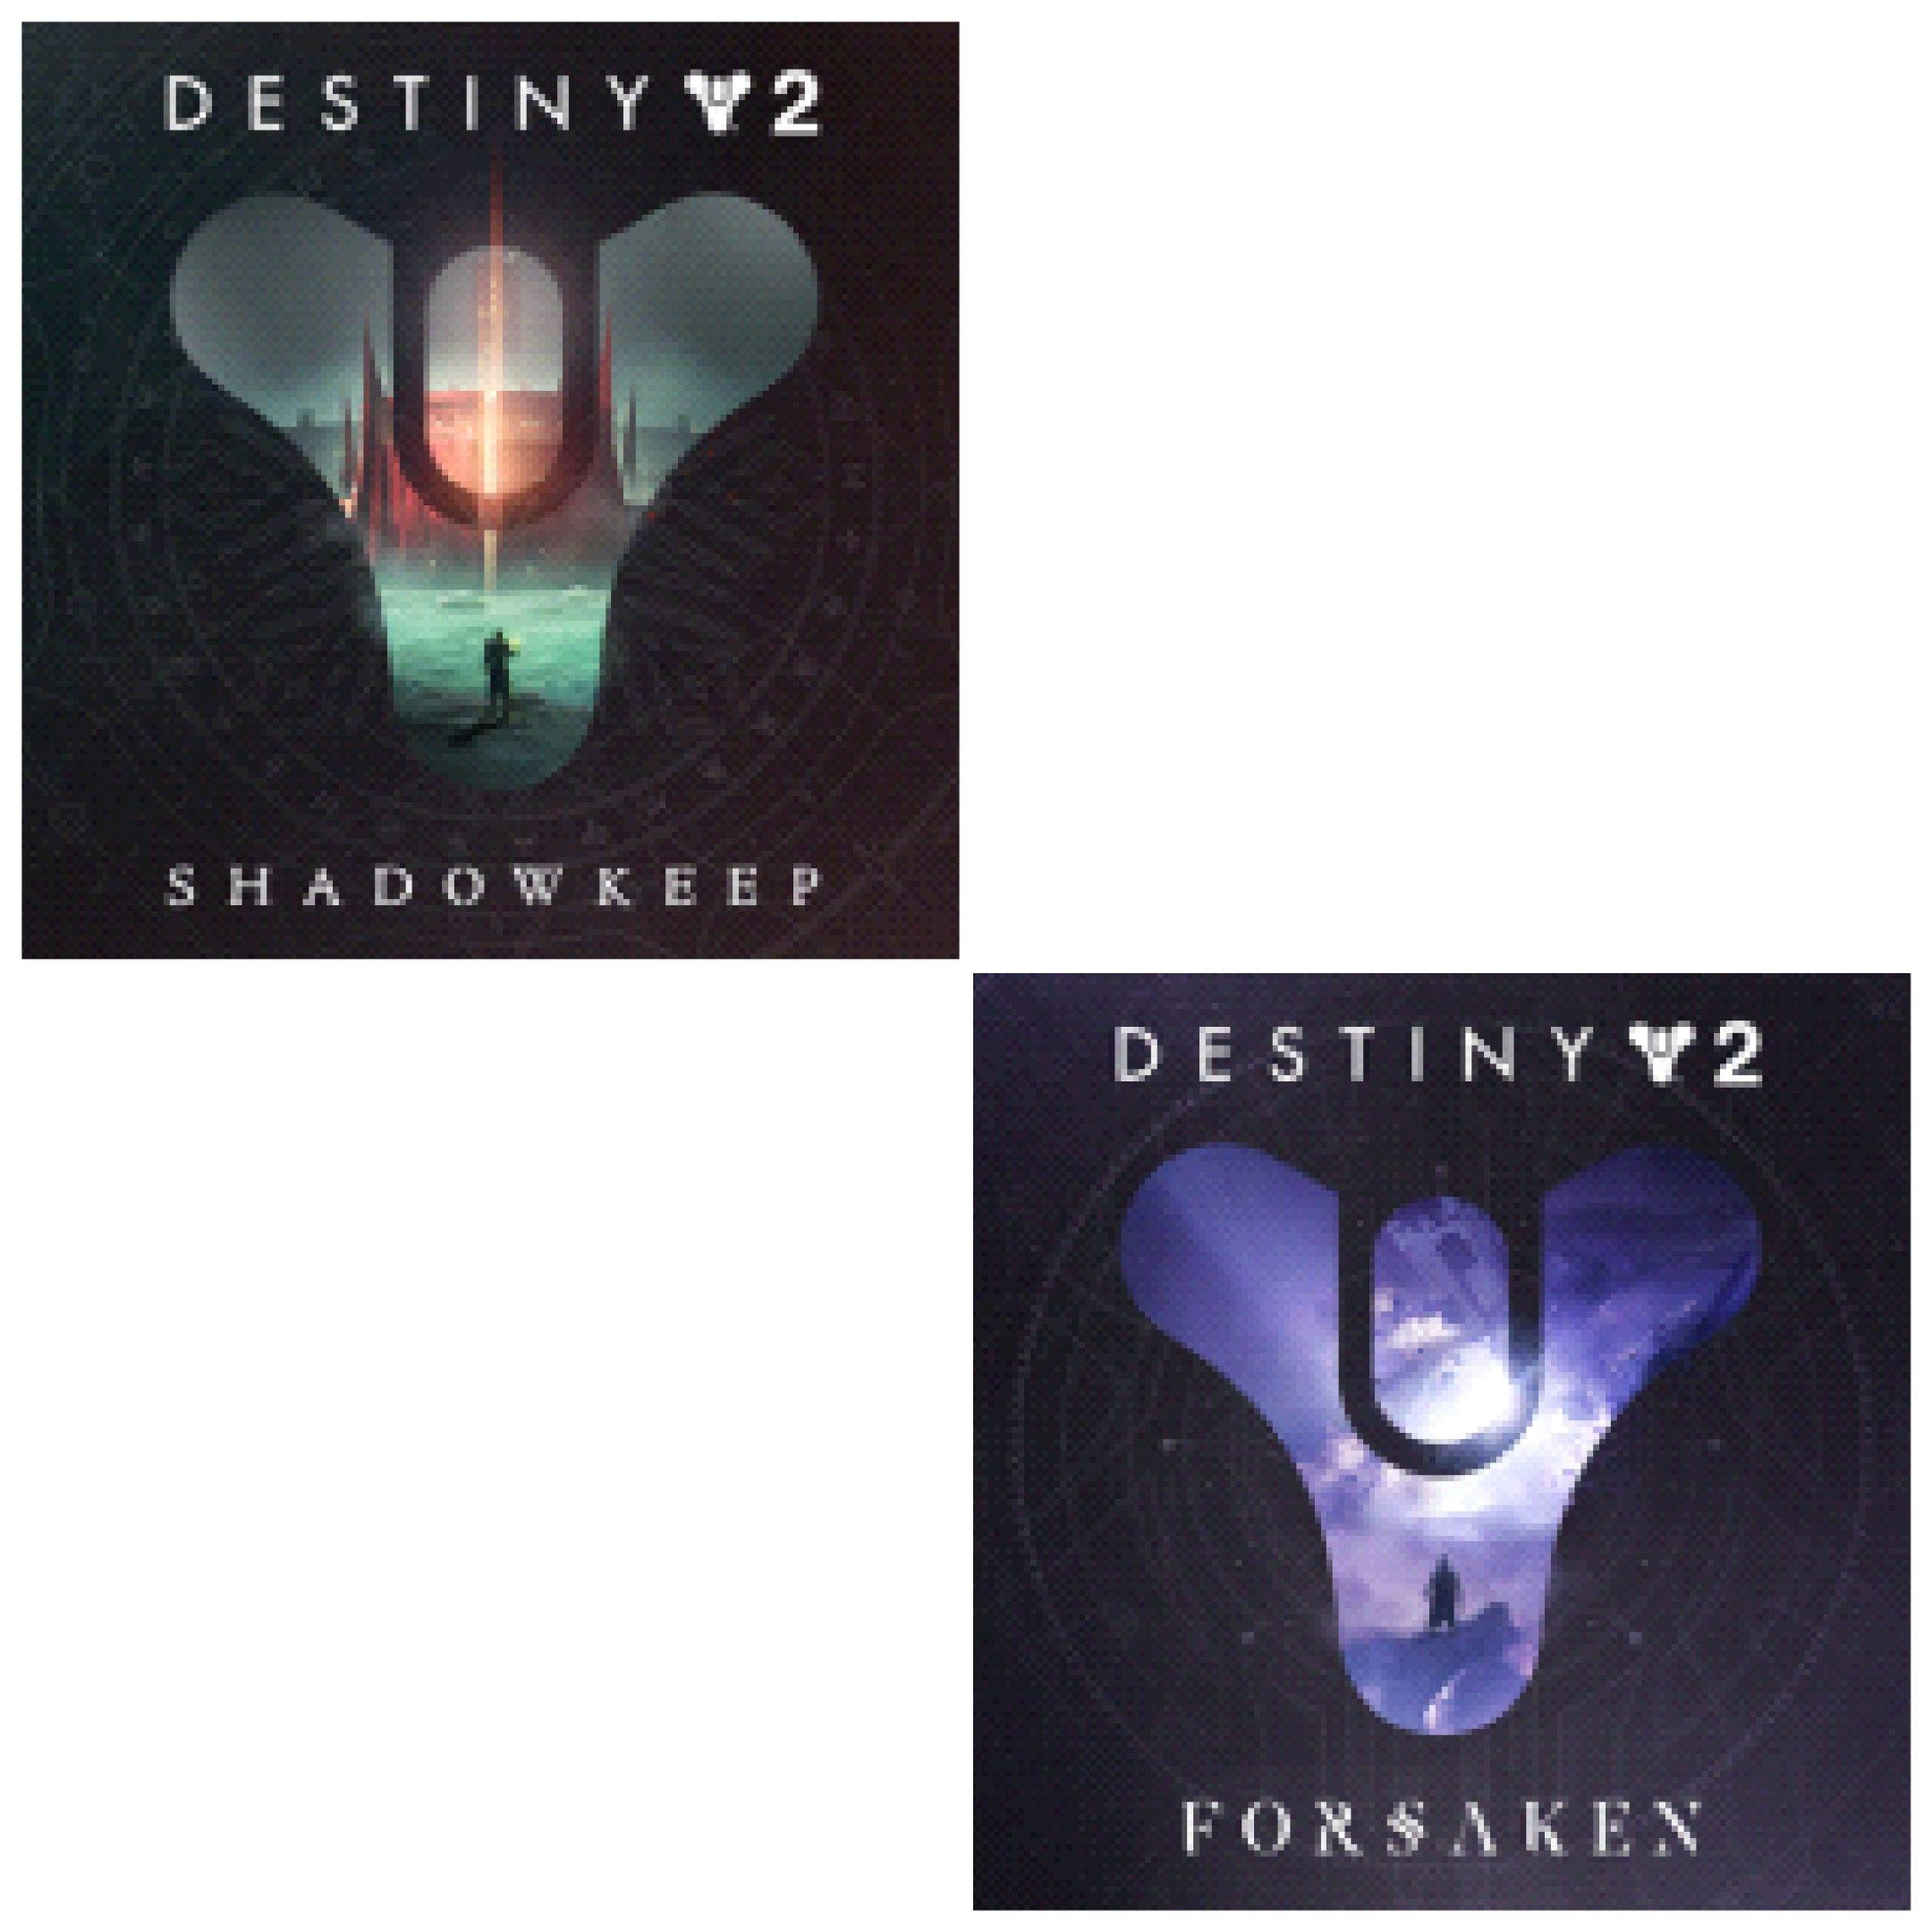 [Steam] Destiny 2: Shadowkeep / Forsaken (PC) - £9 each @ GreenMan Gaming